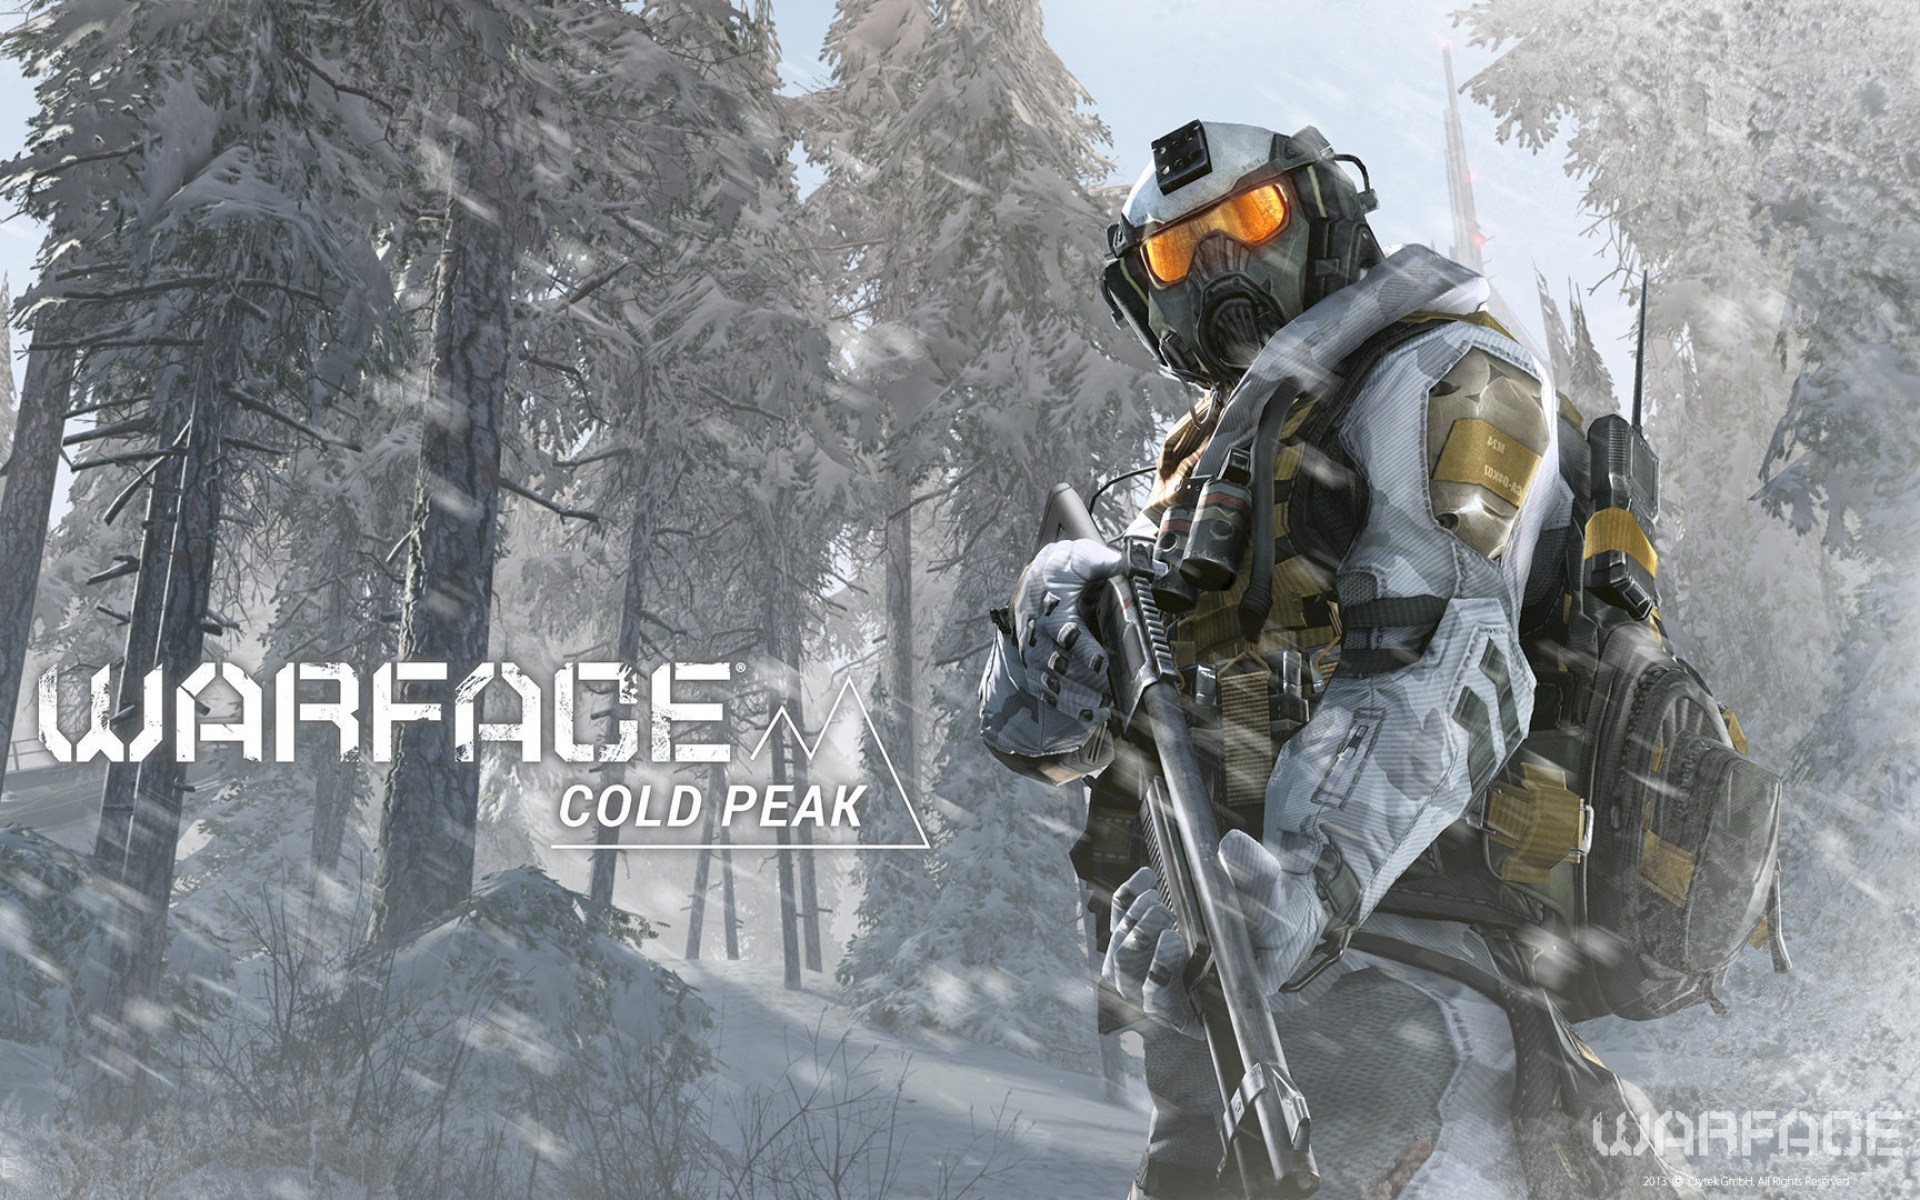 Warface - Operation Cold Peak Computer Wallpapers, Desktop ...: https://wall.alphacoders.com/big.php?i=672140